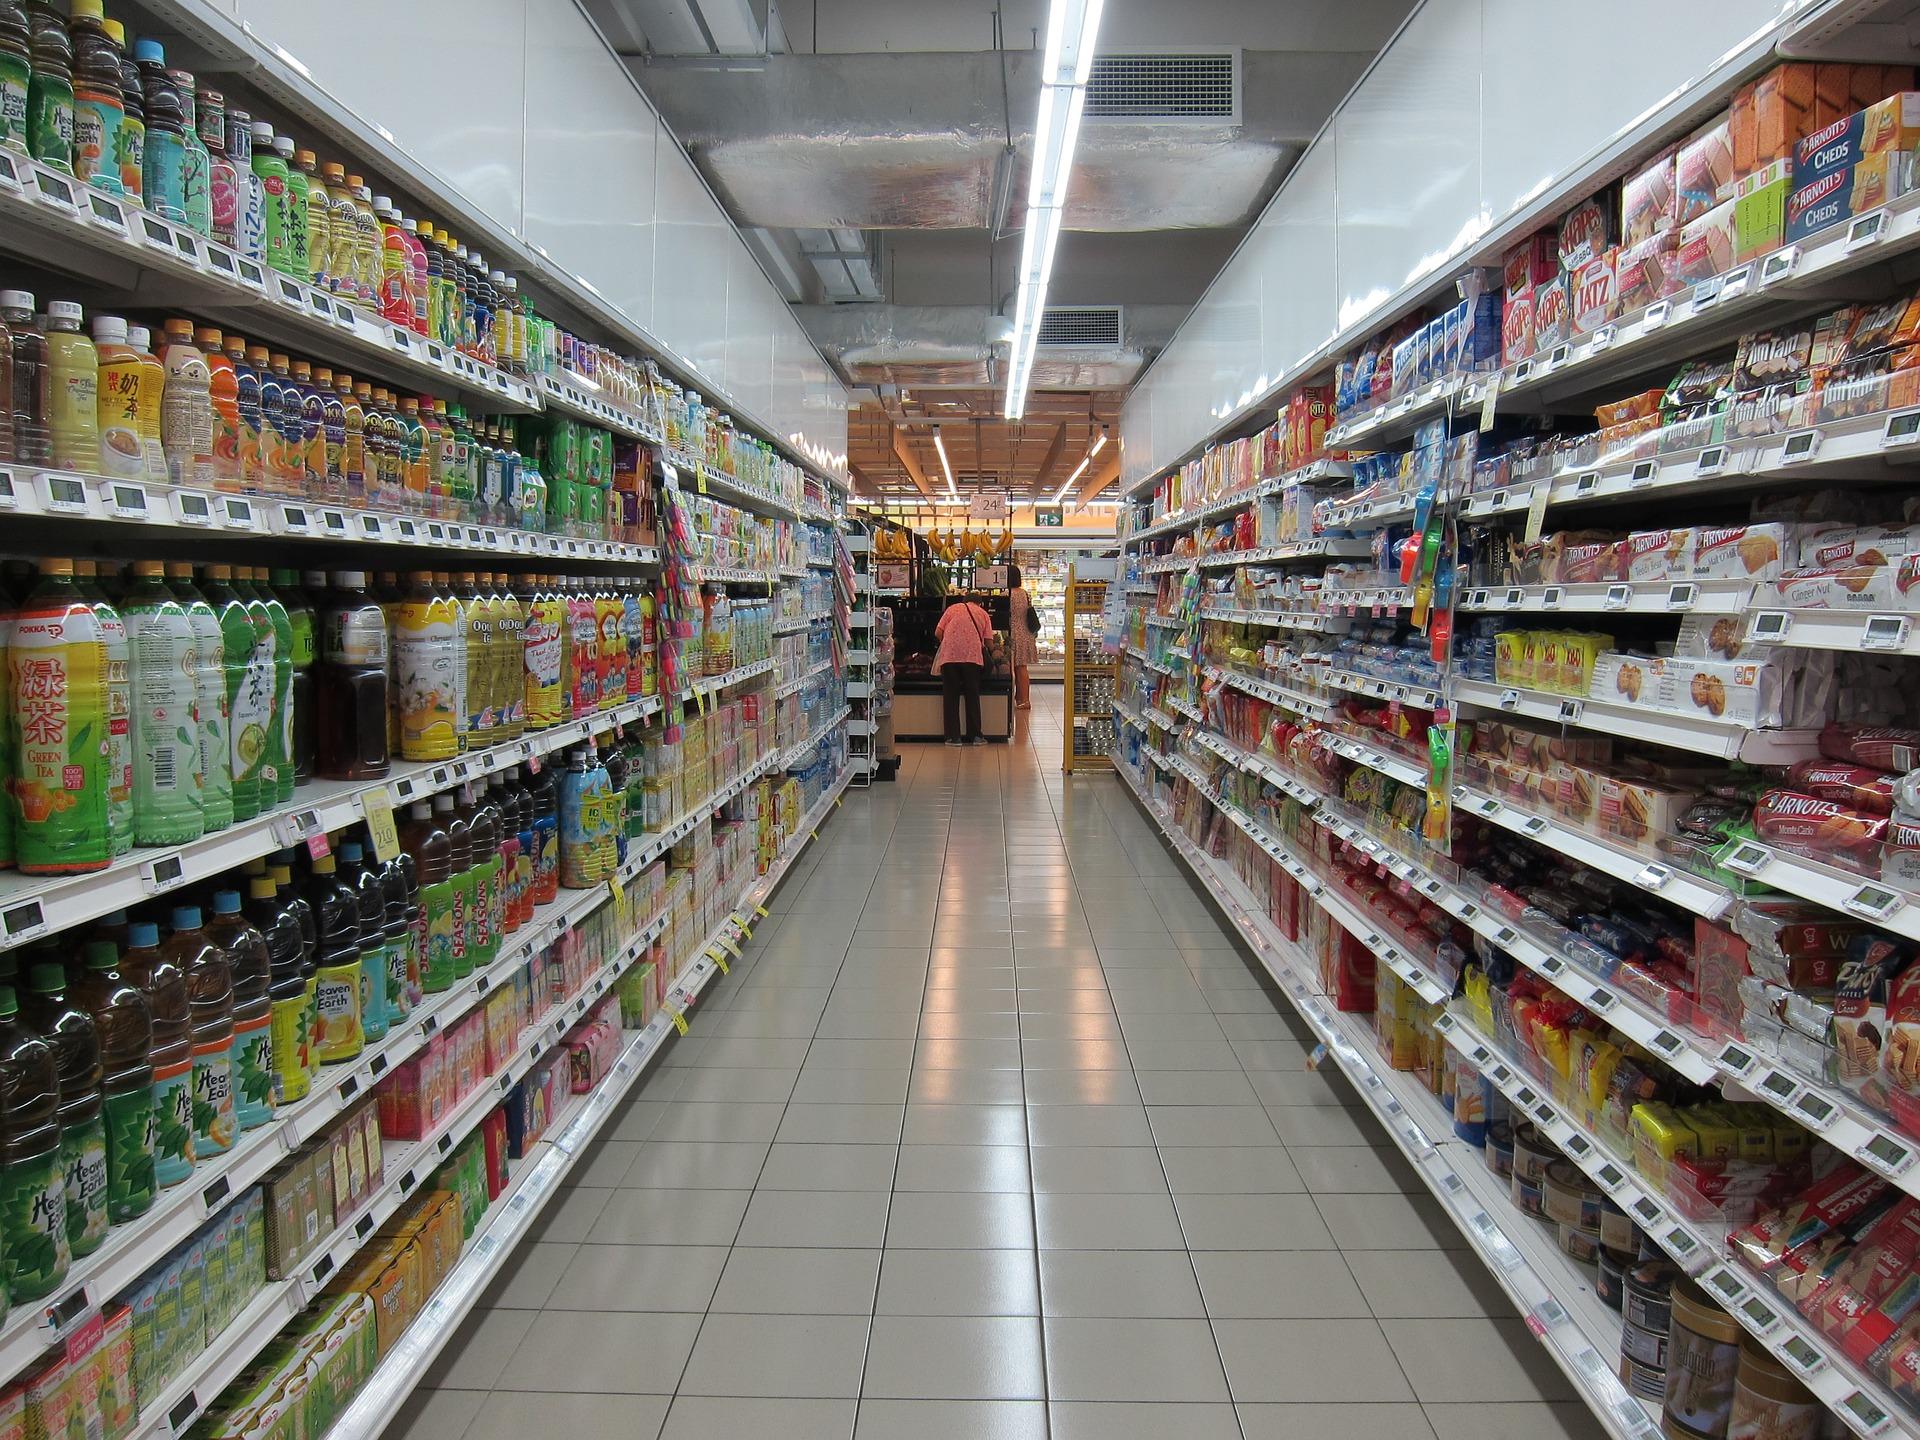 grocery-store-2619380_1920.jpg